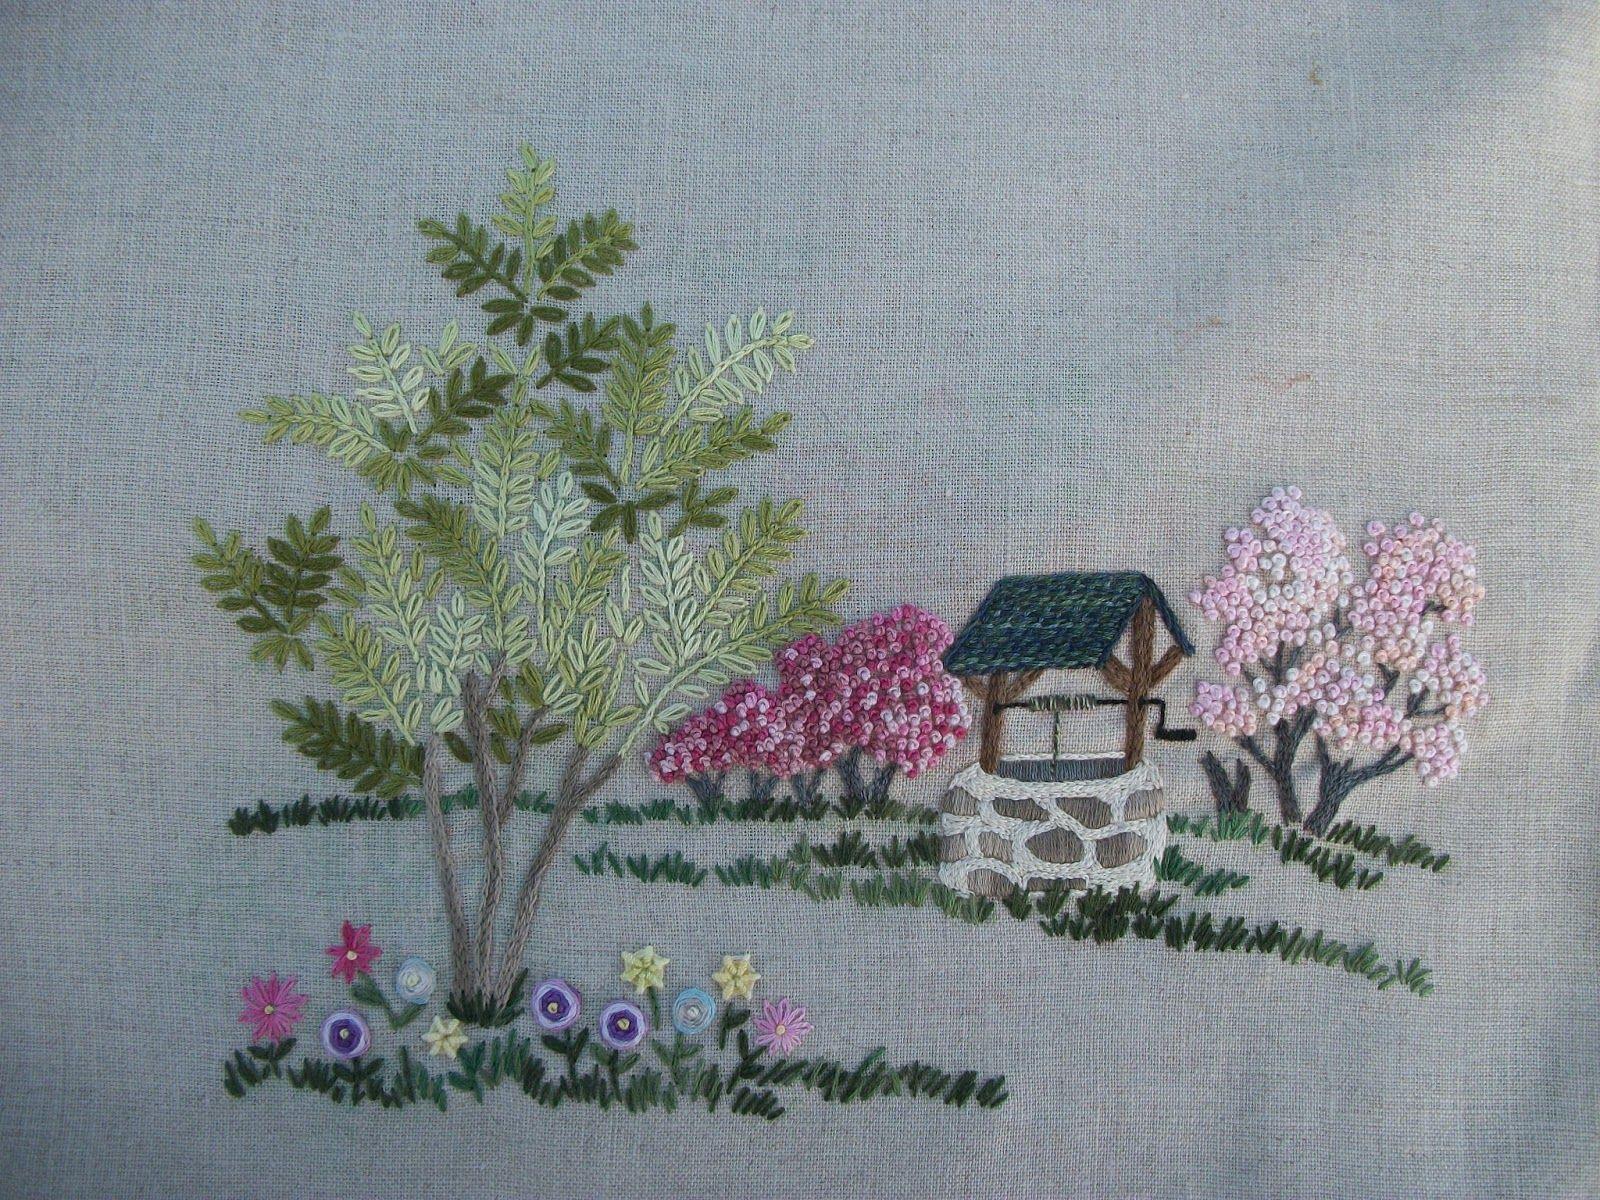 Ribbon embroidery bedspread designs - 100_2004 Jpg 1 600 1 200 Pixels Ribbon Embroideryembroidery Stitchescottagesvintage Designsbaby